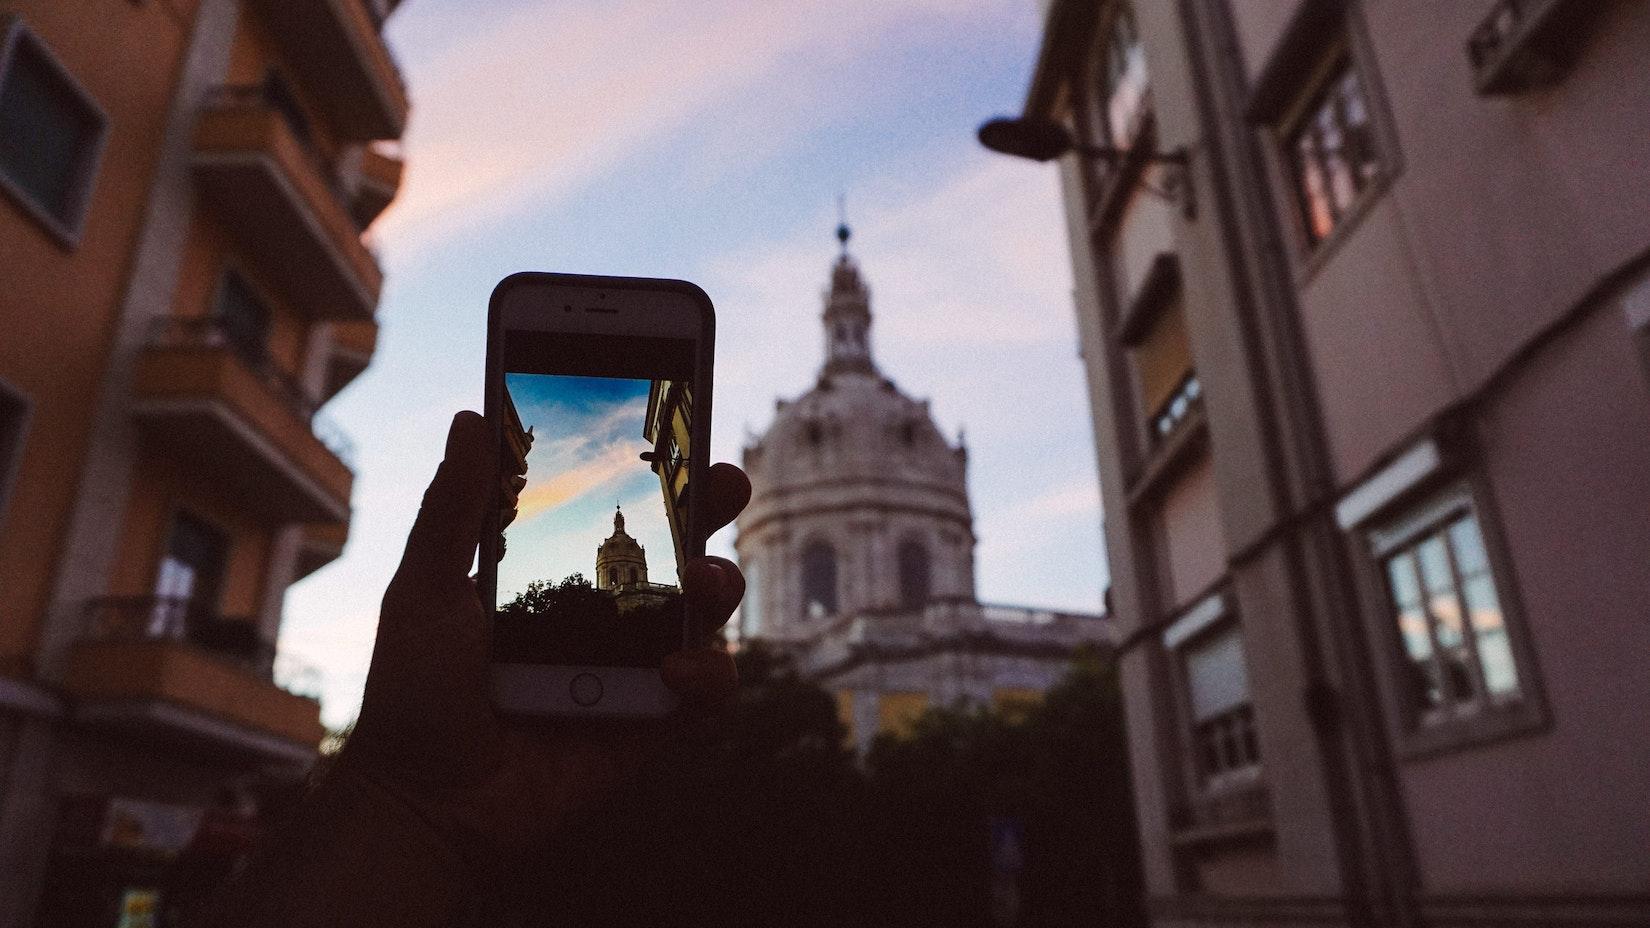 Becca taking a photo of Basilica da Estrela in Lisbon